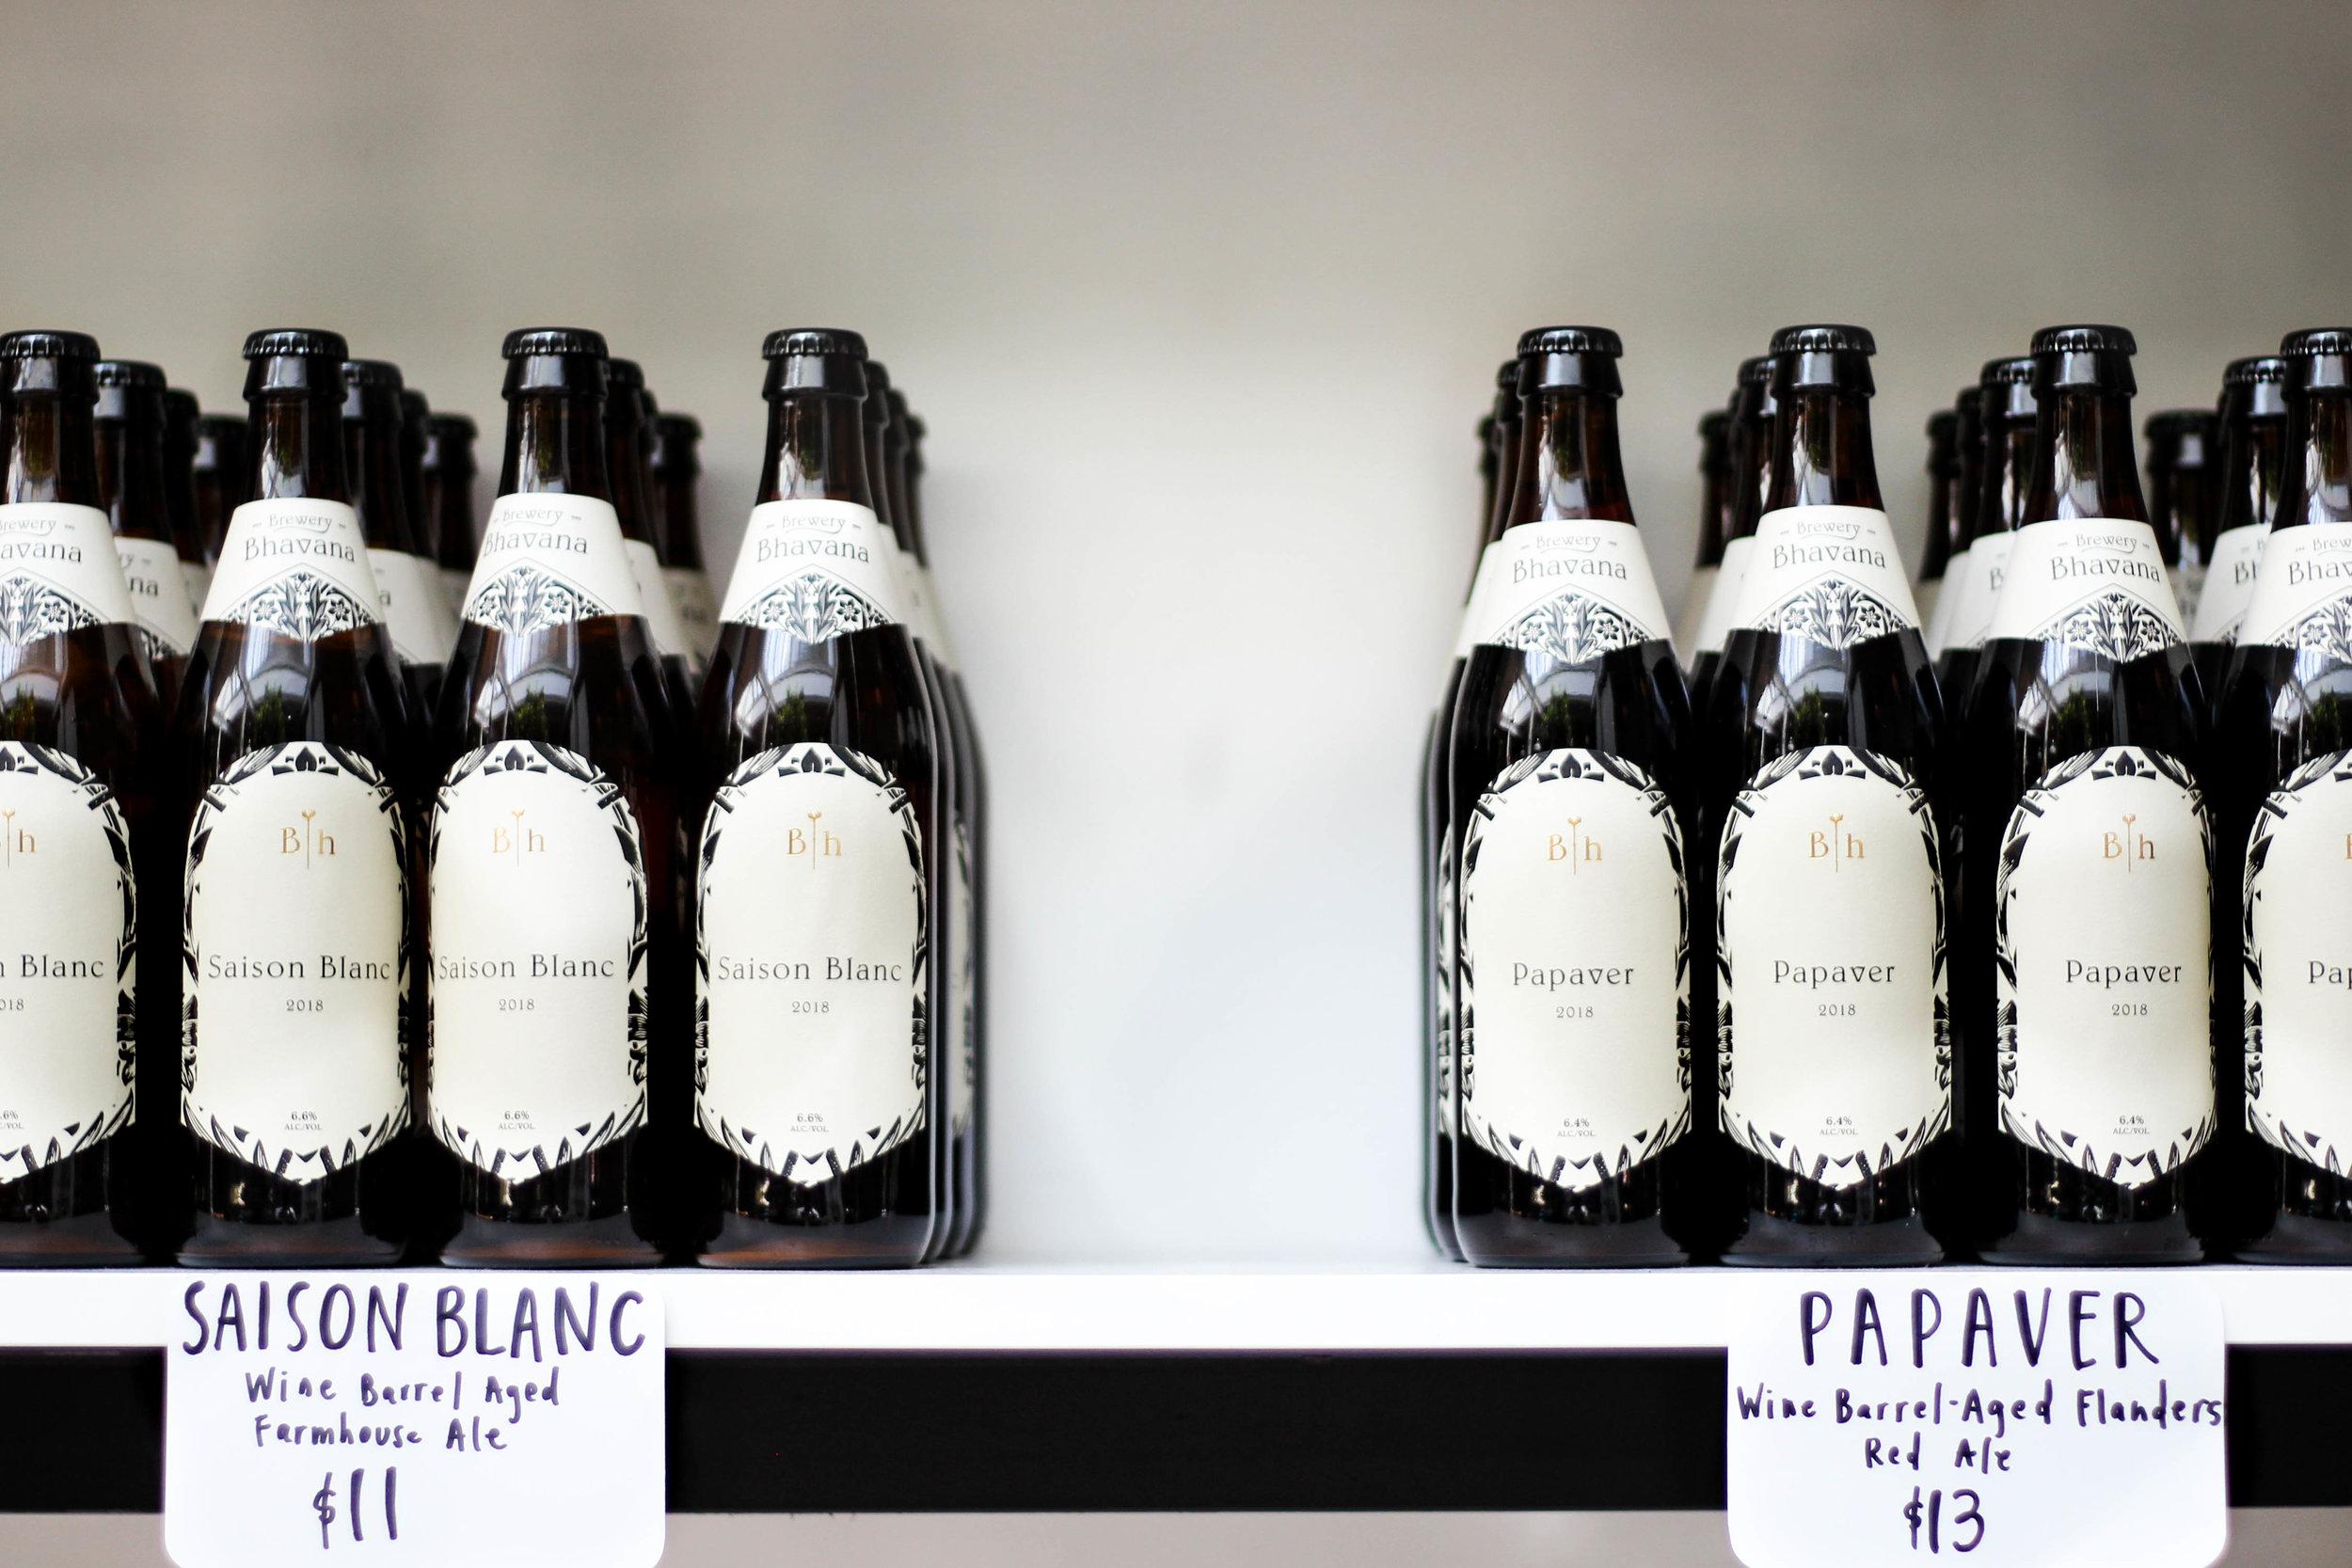 valerie-eguavoen-on-a-curve-food-brewery-bhavana-8300.jpg